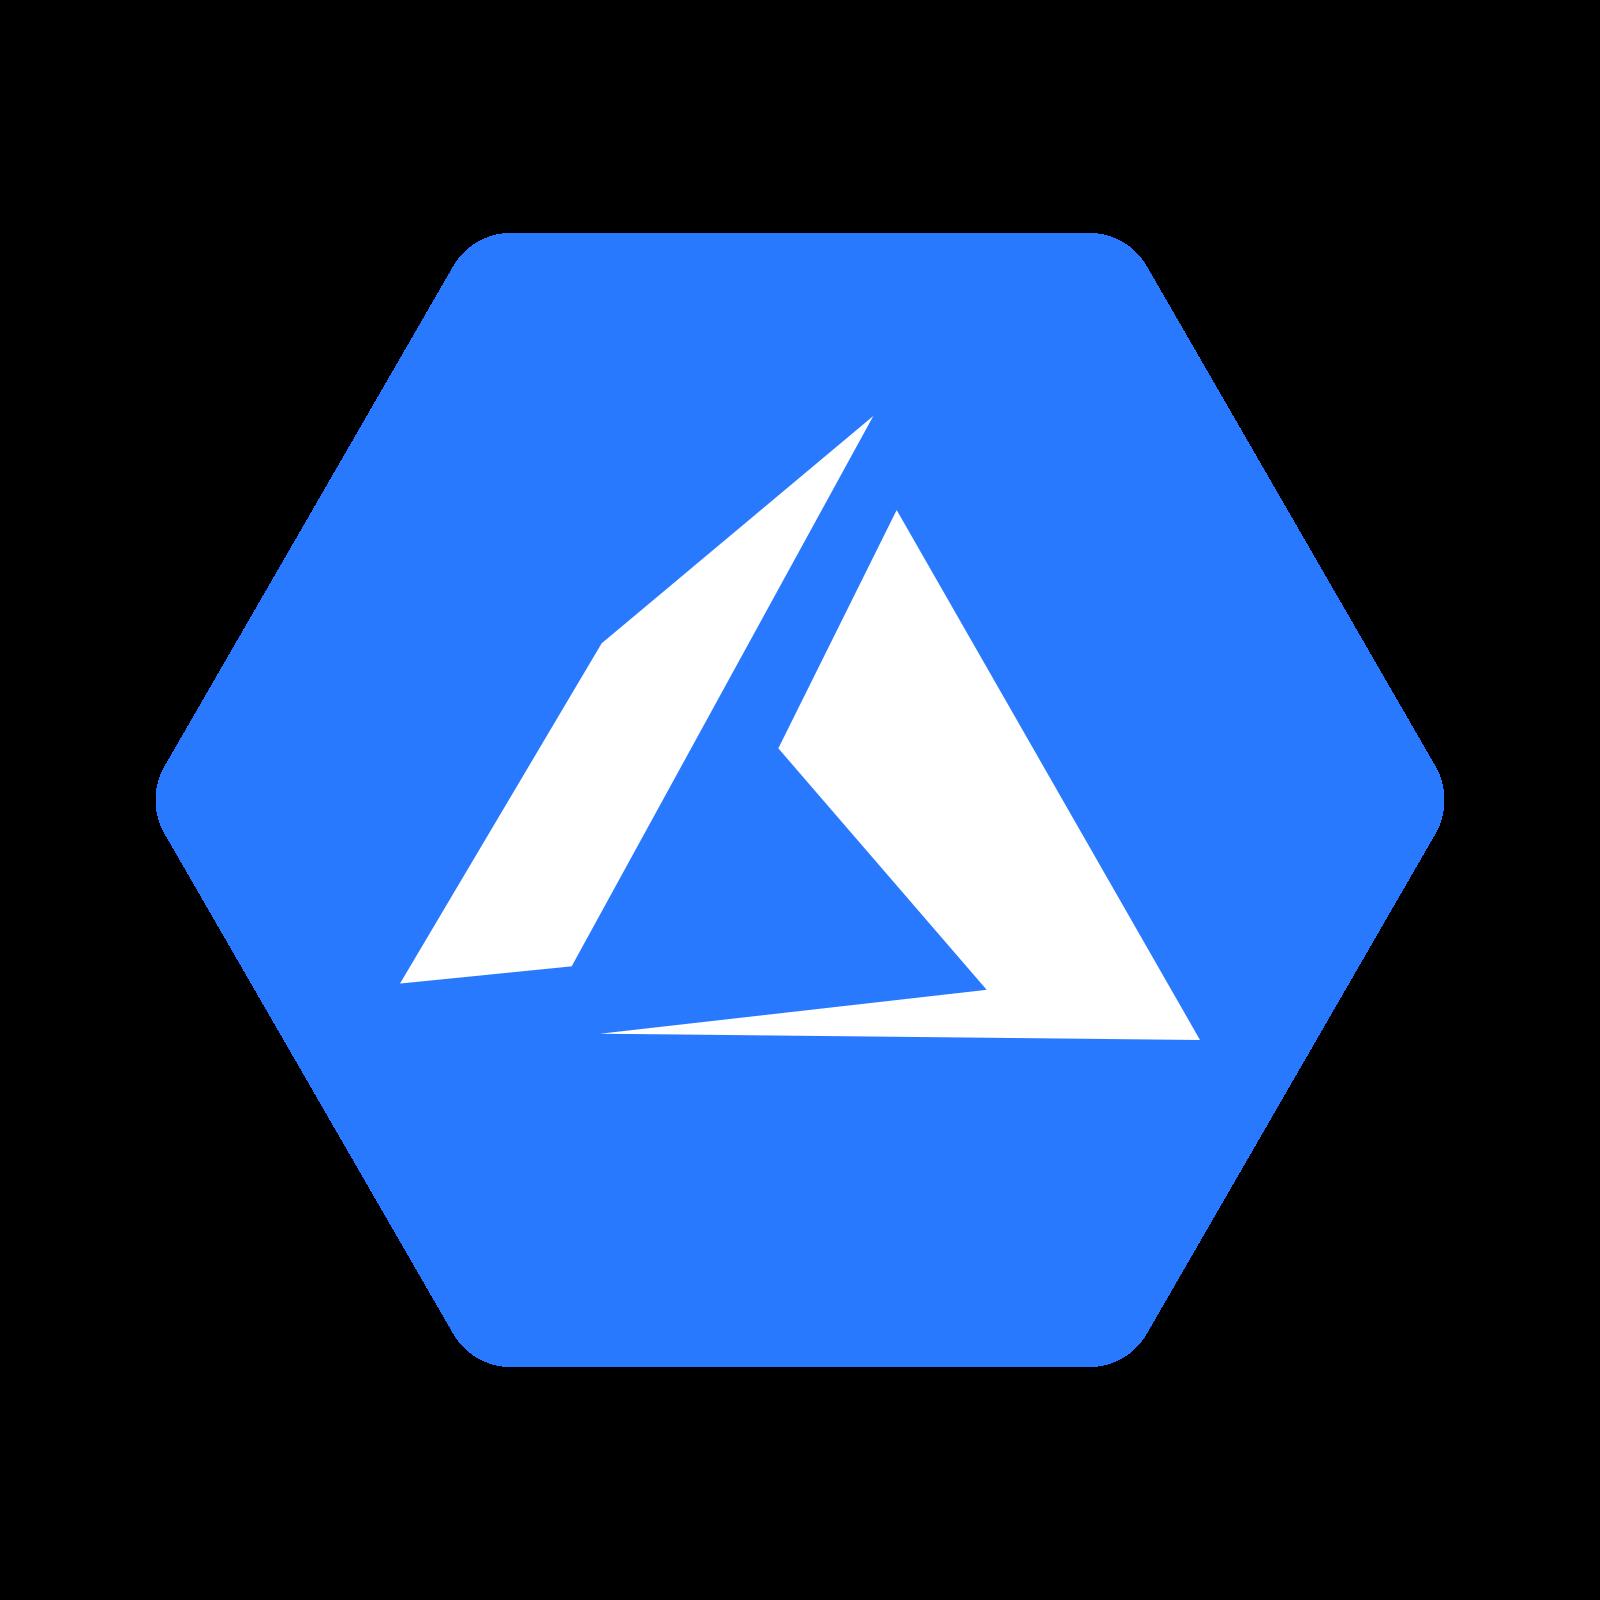 Azure Storage Connection icon